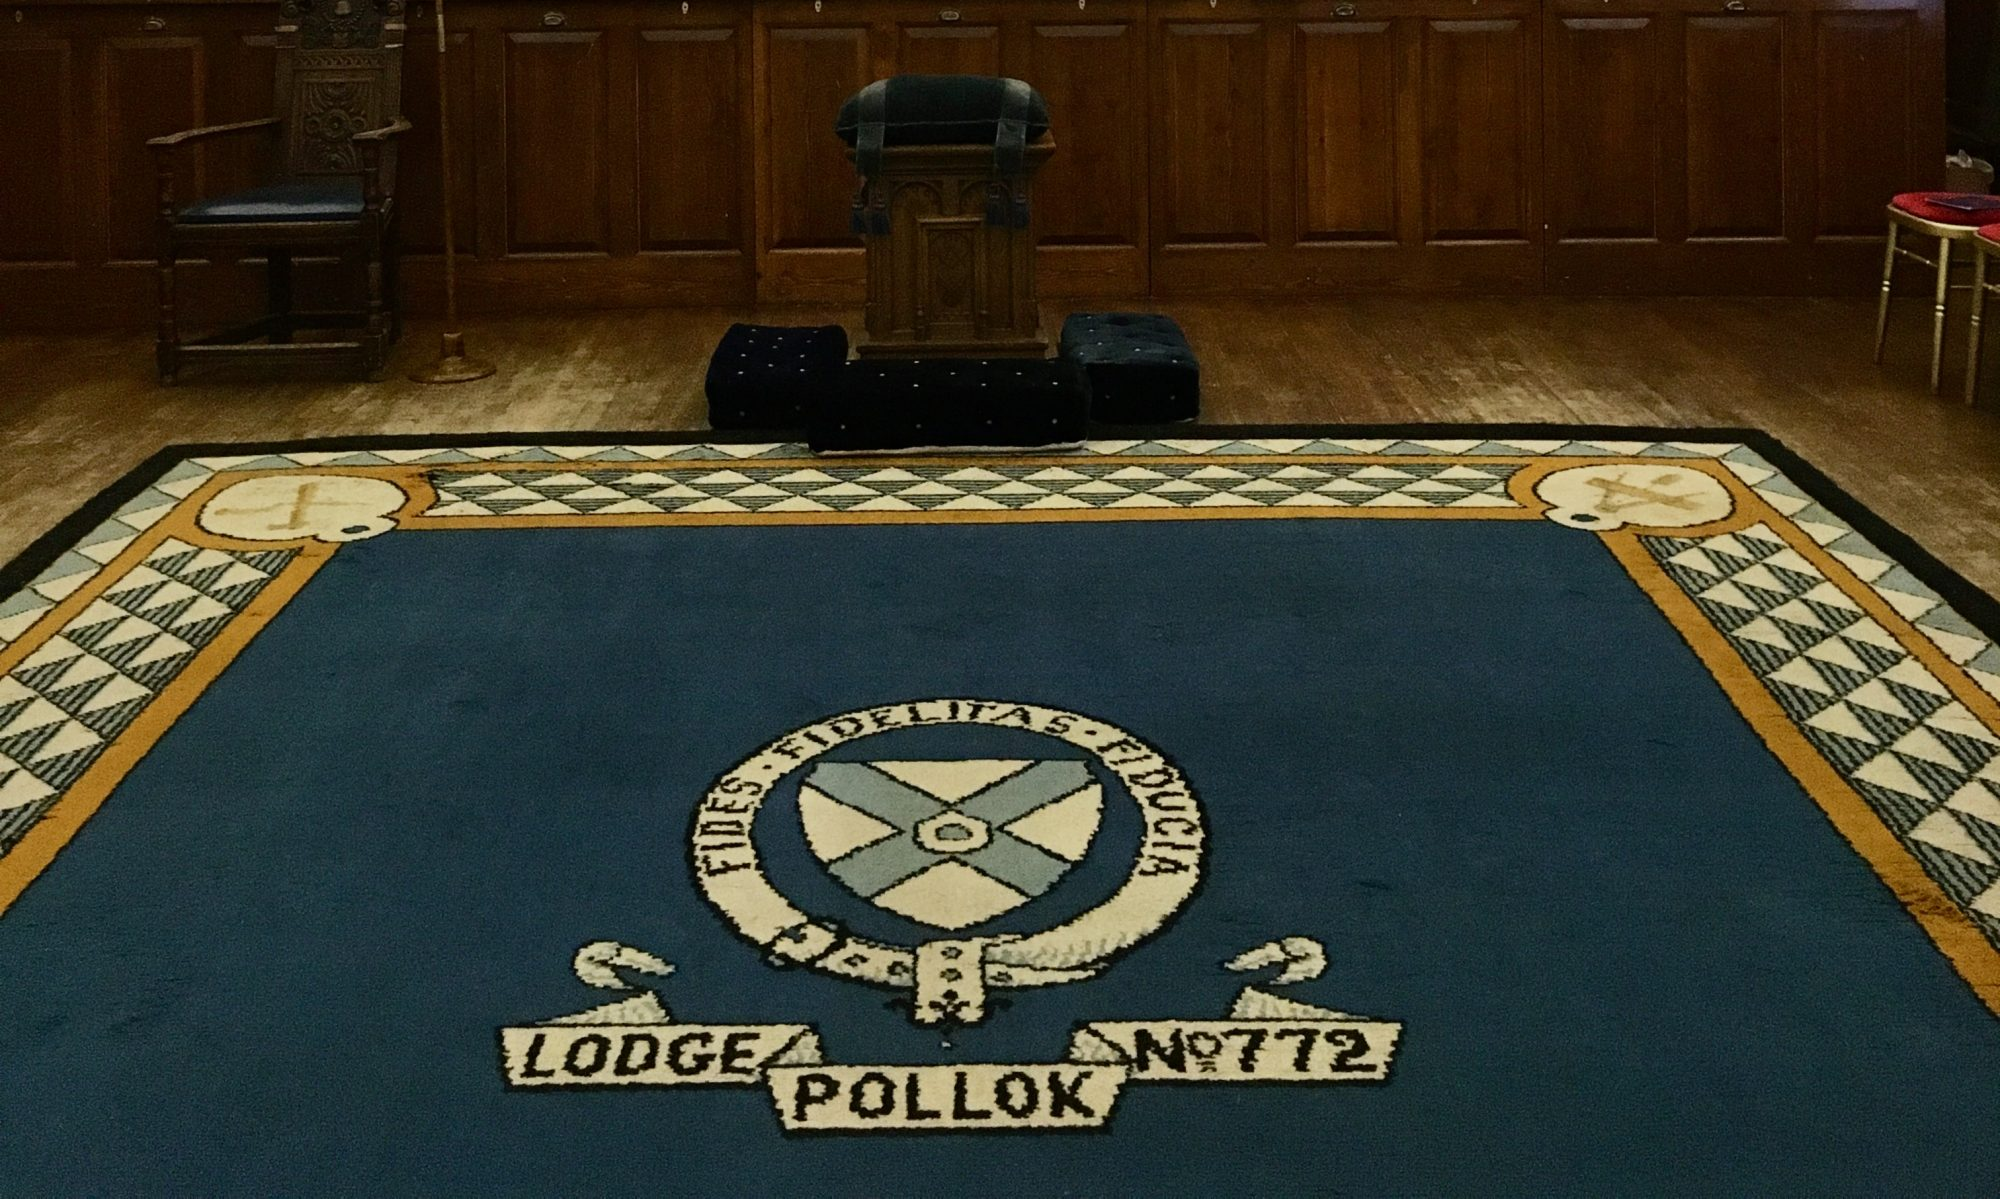 Lodge Pollok